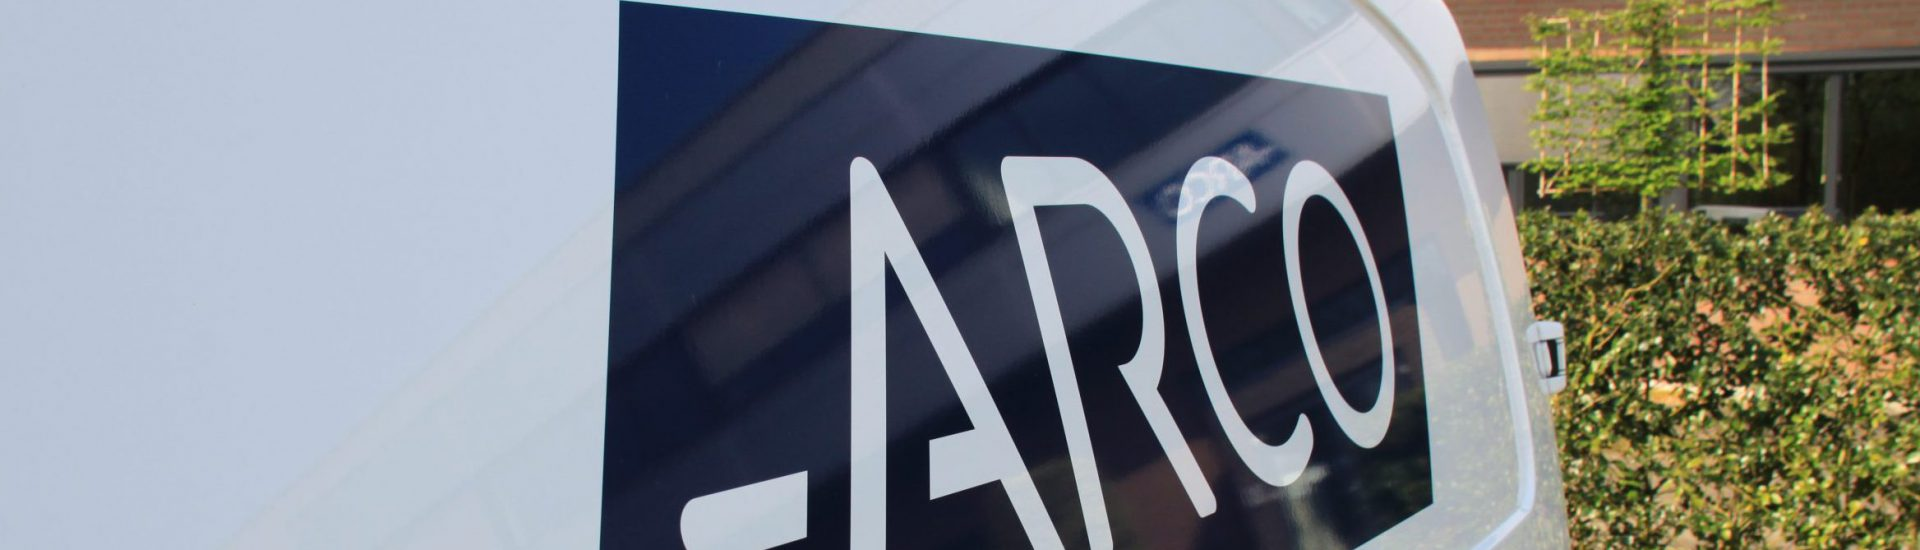 ARCO bus